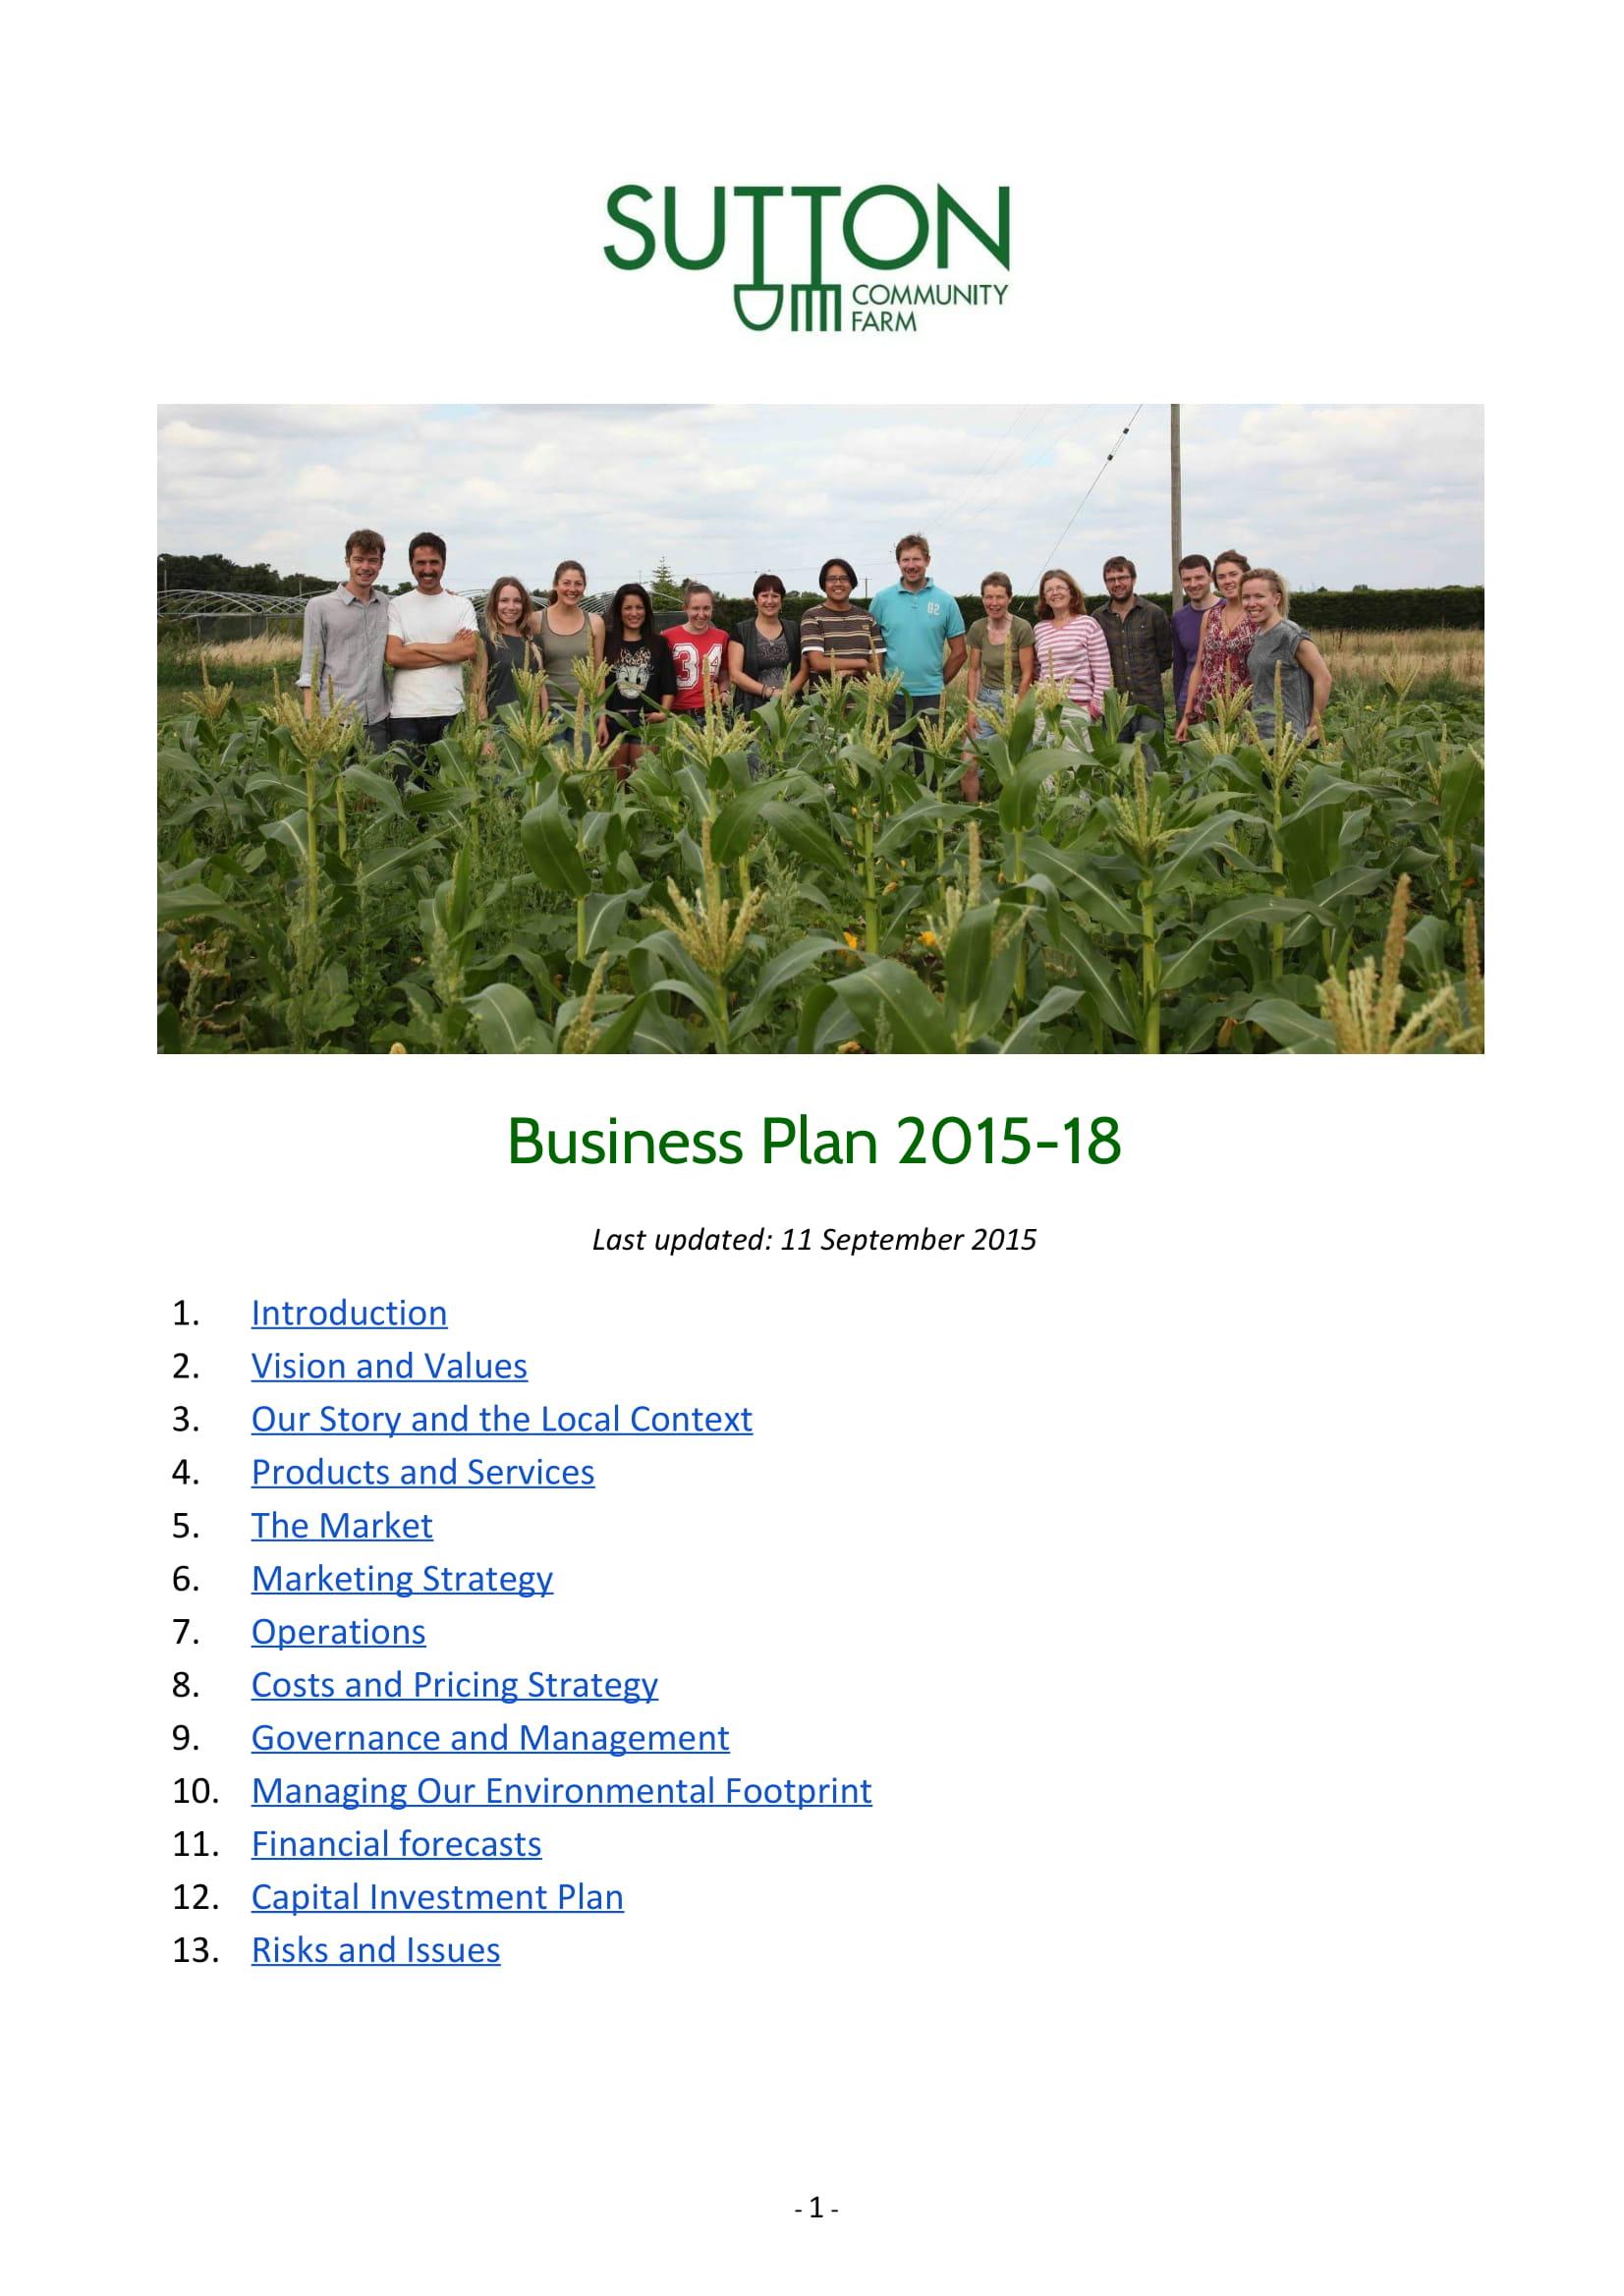 community farm business plan example 01